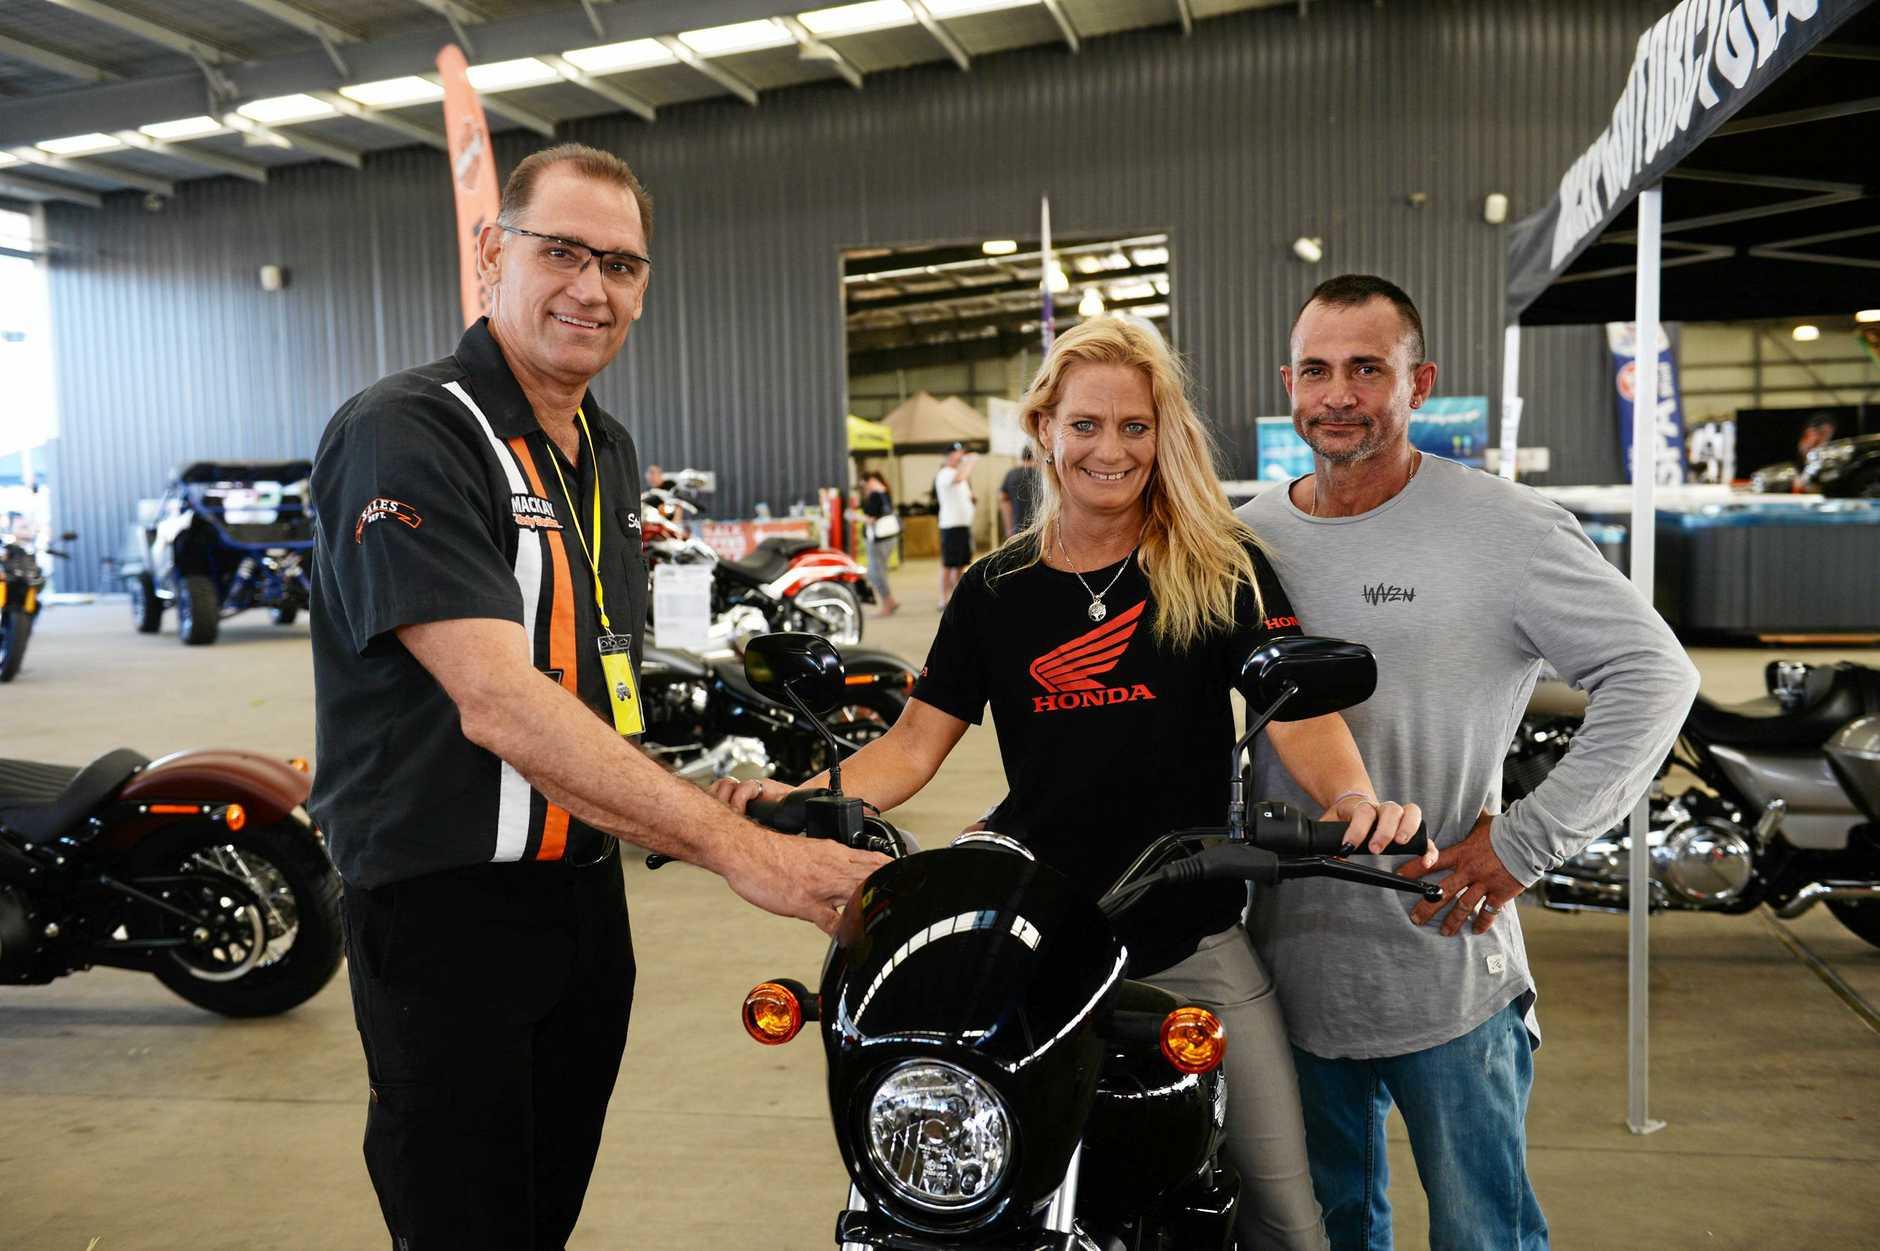 Big Boys Toys expo at Mackay Showgrounds. Scott Gralow of Mackay Motorcycles with Katrina and Anthony Ghilotti